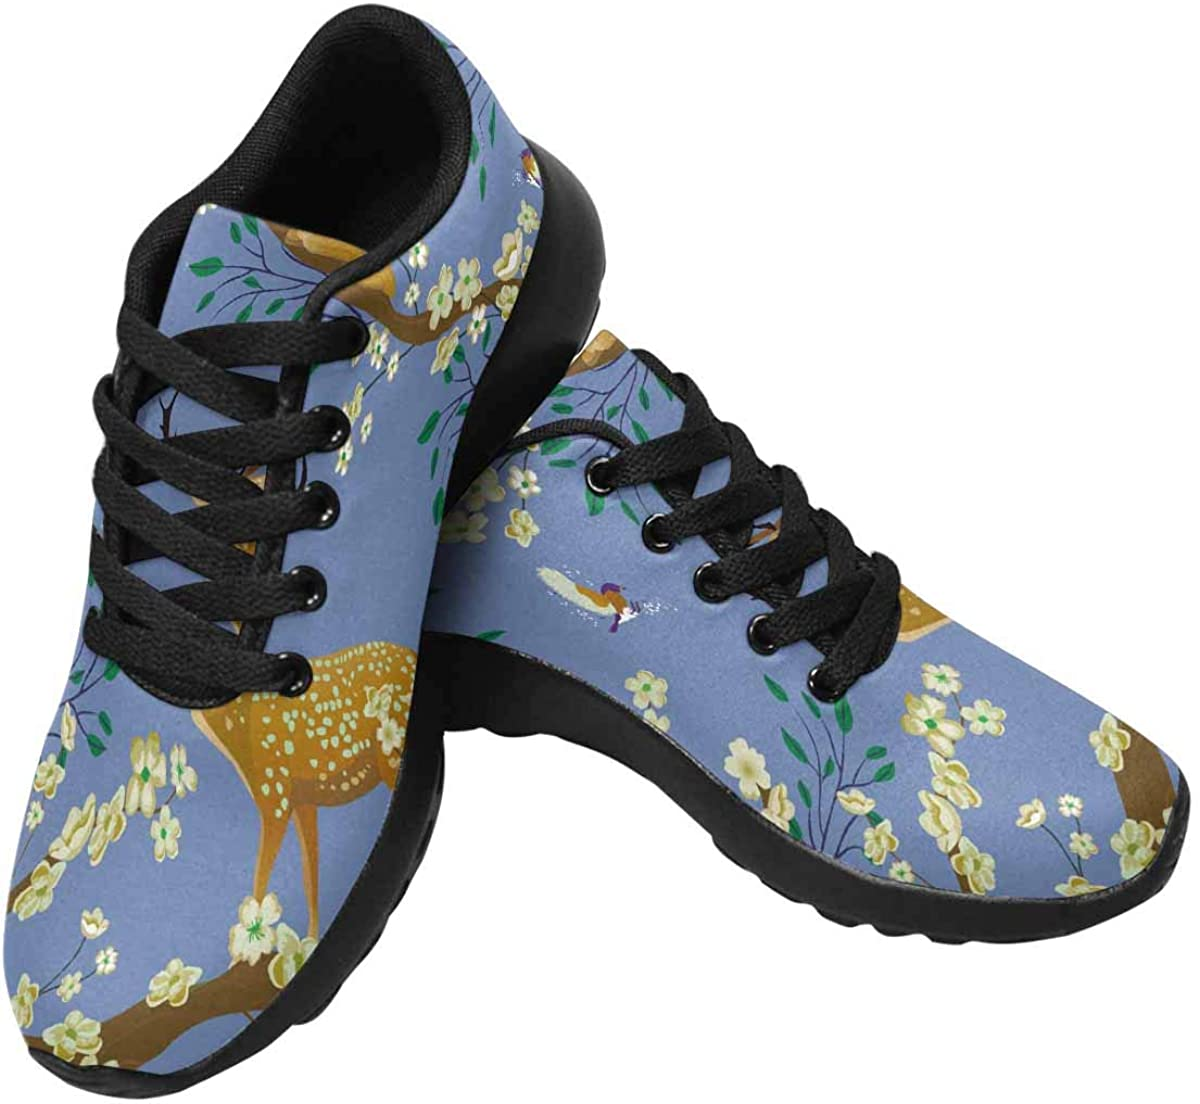 INTERESTPRINT Flowering, Flying Birds and Sika Deer Womens Running Shoes Lightweight Sneakers Athletic Tennis Sport Shoes